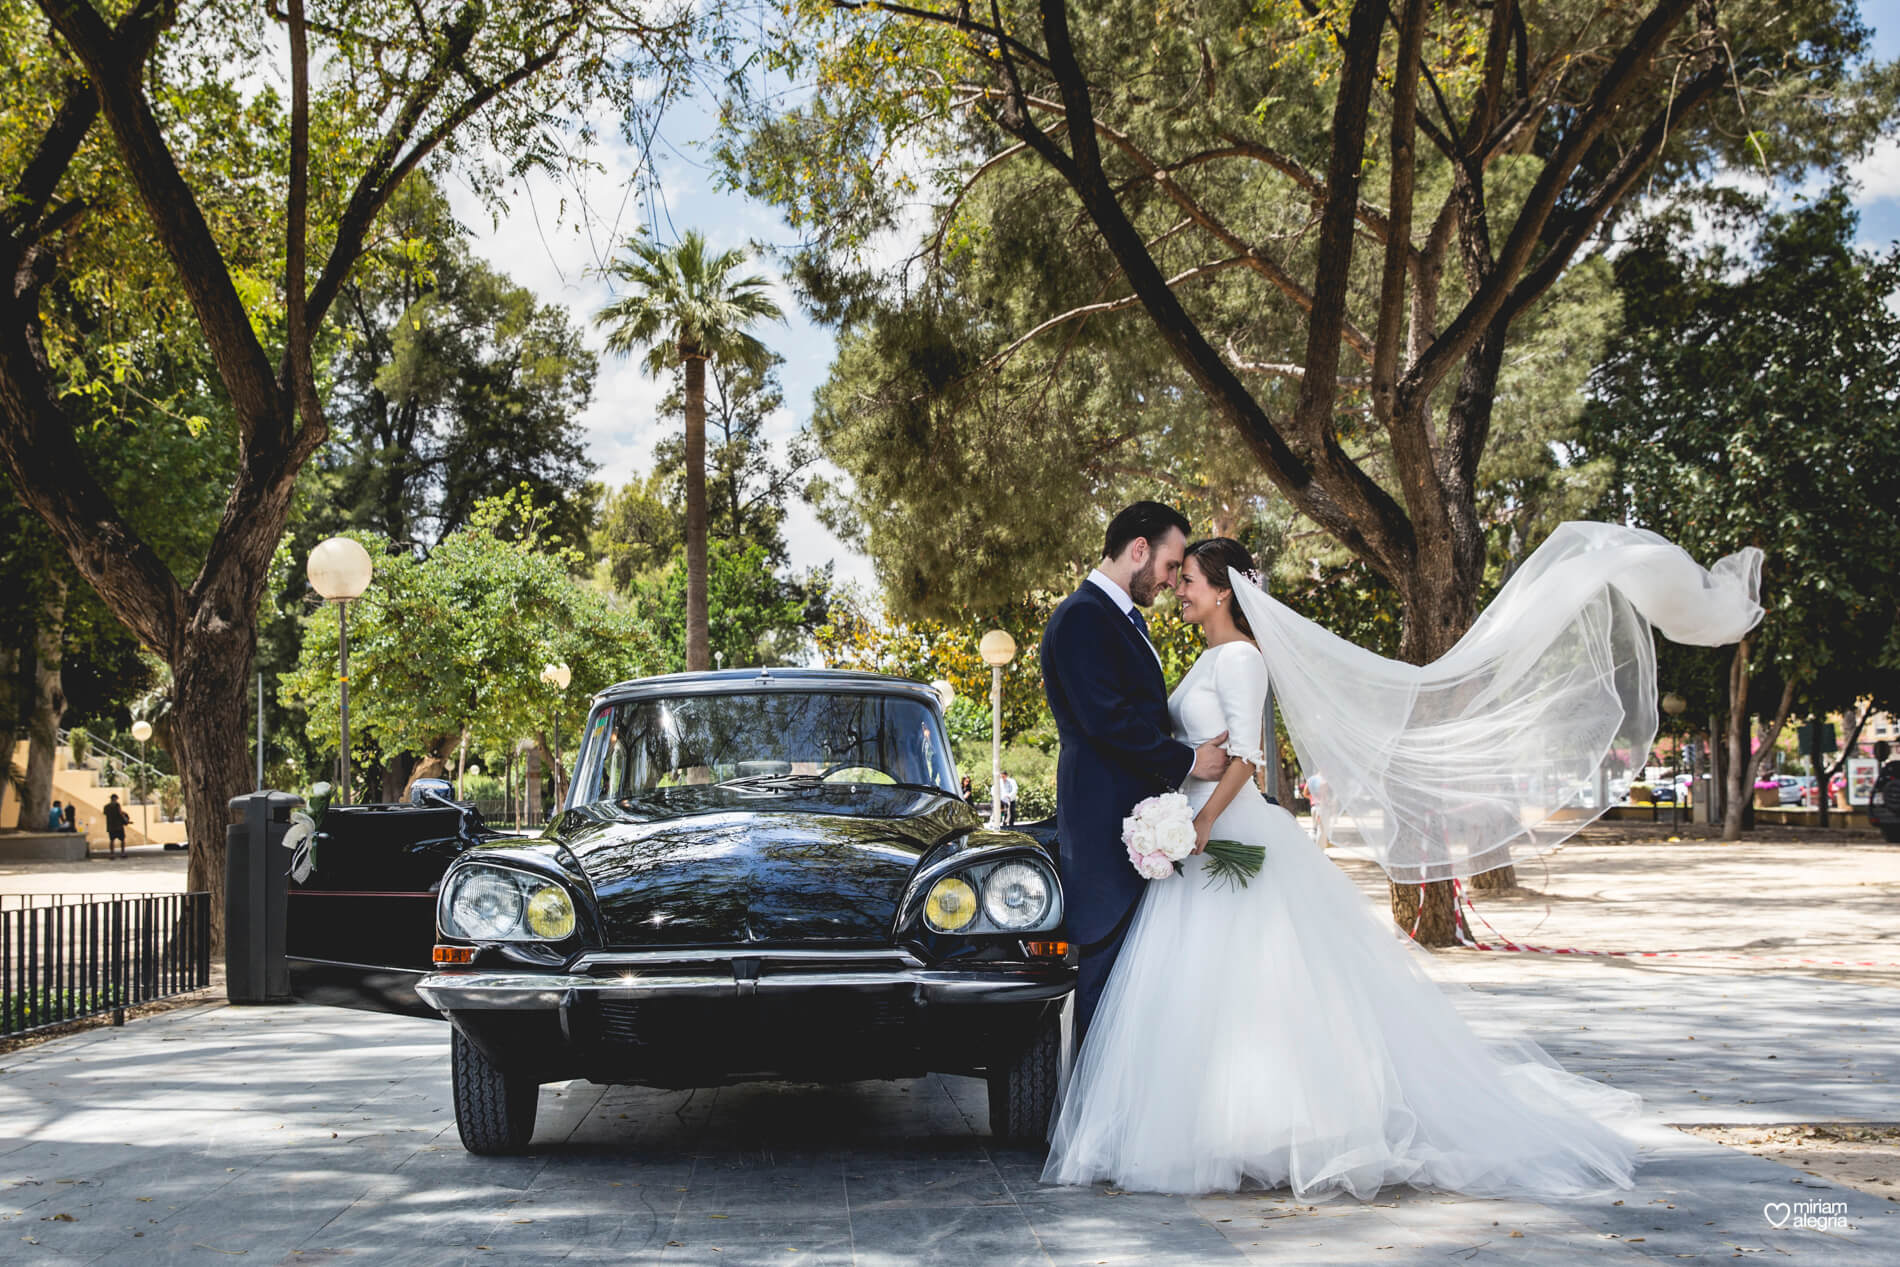 boda-en-la-catedral-de-murcia-miriam-alegria-fotografos-boda-murcia-62